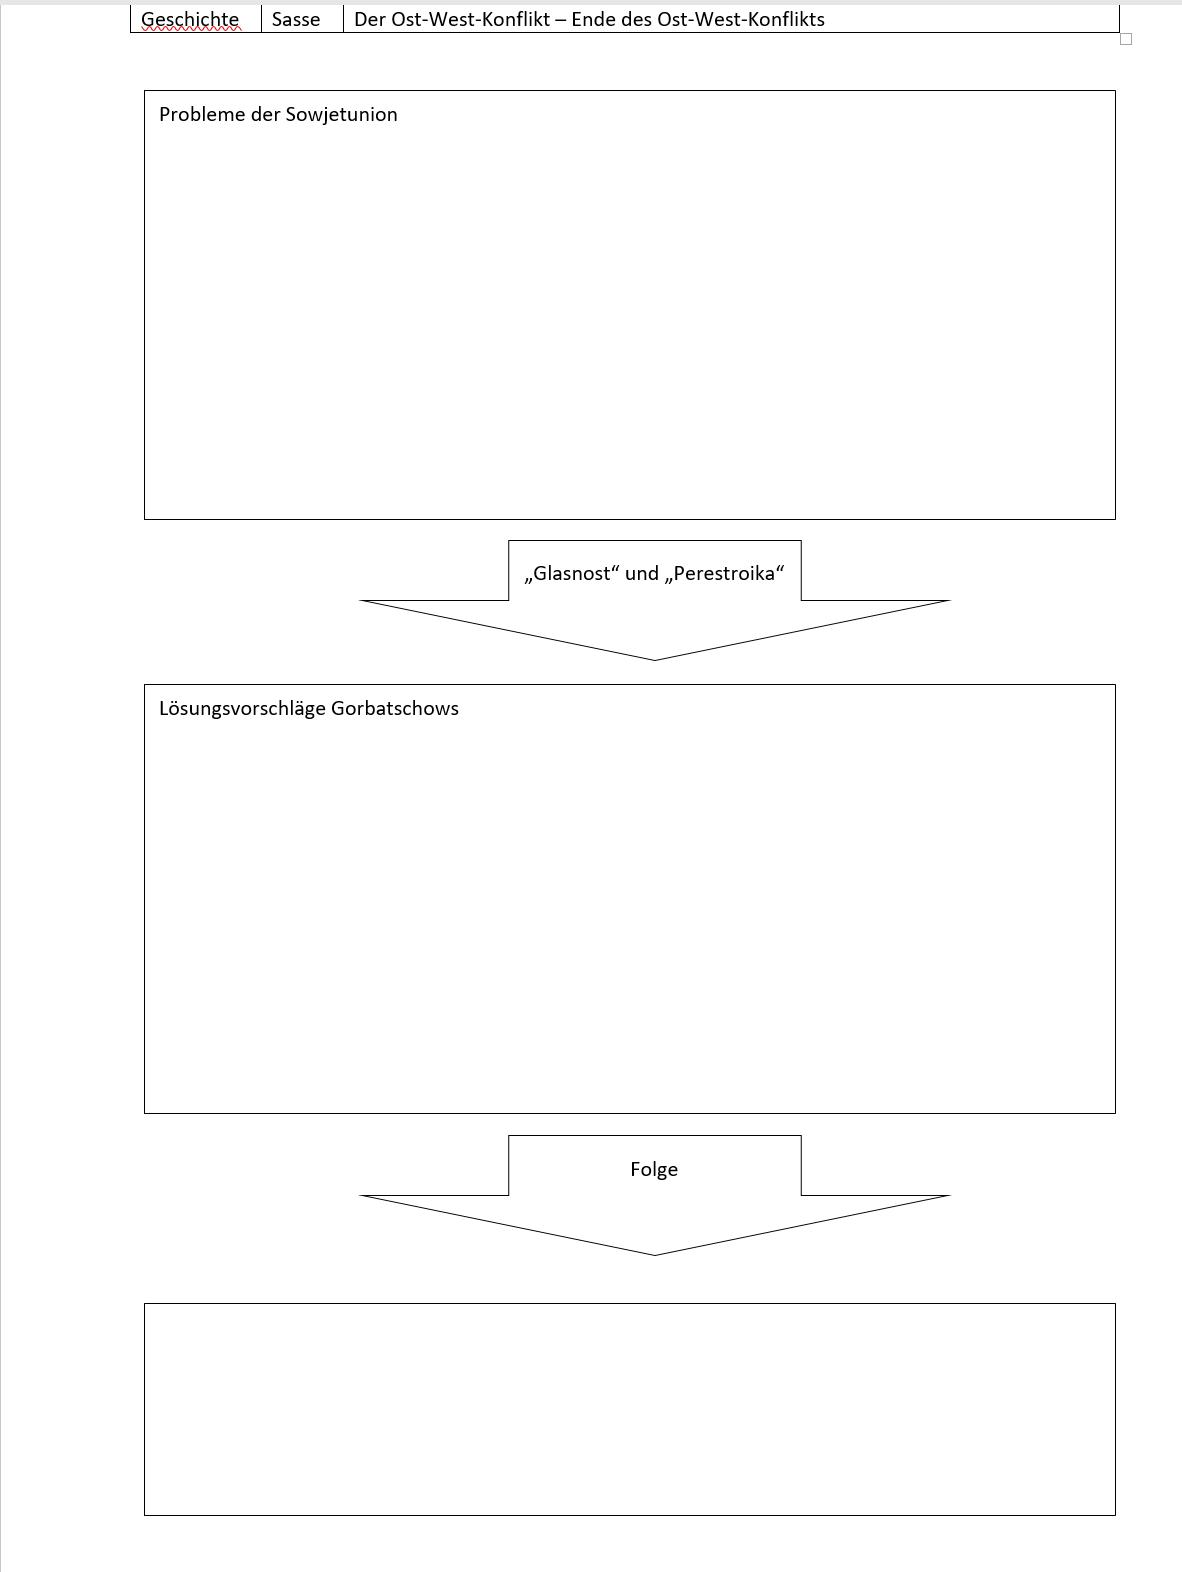 Großzügig Sätze Und Fragmente Arbeitsblatt Ideen - Mathe ...